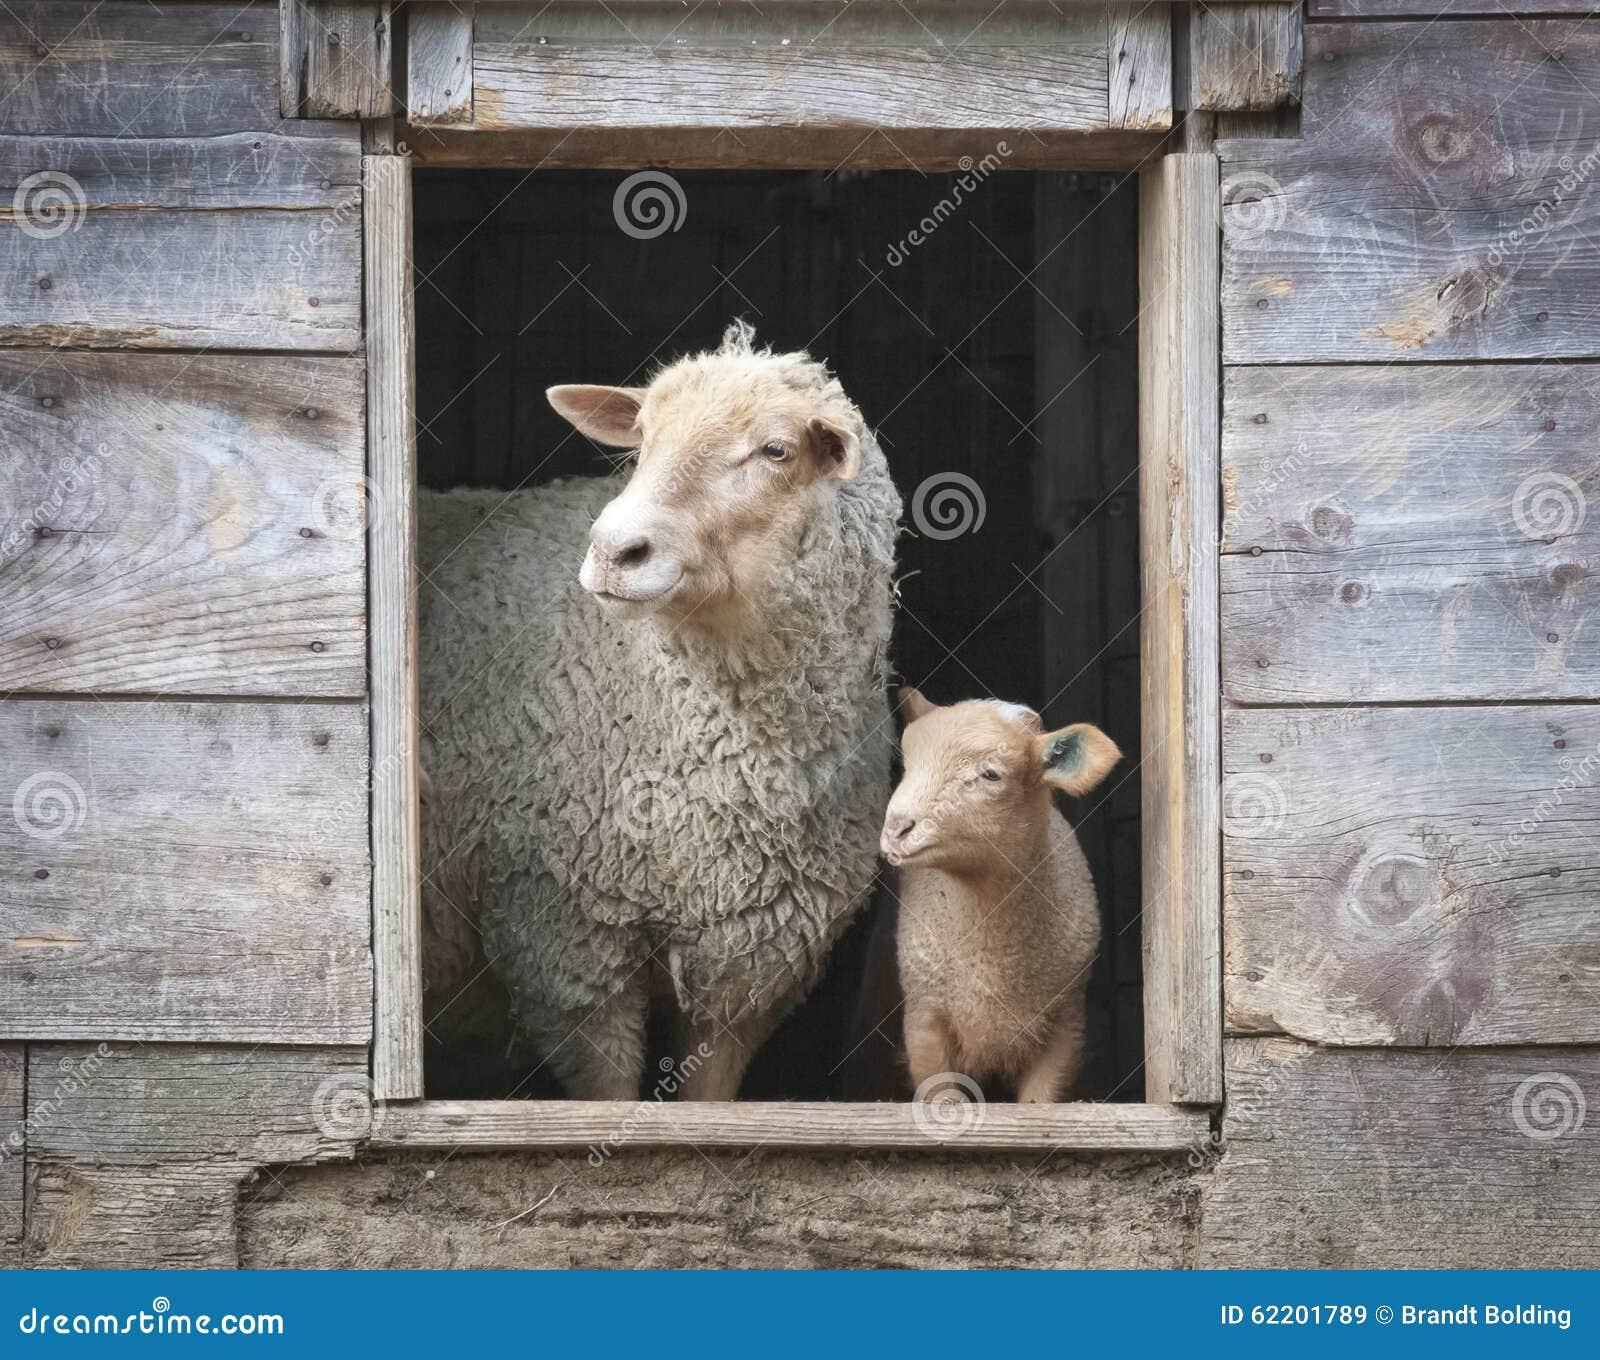 Sheep and Small Ewe, in Wooden Barn Window